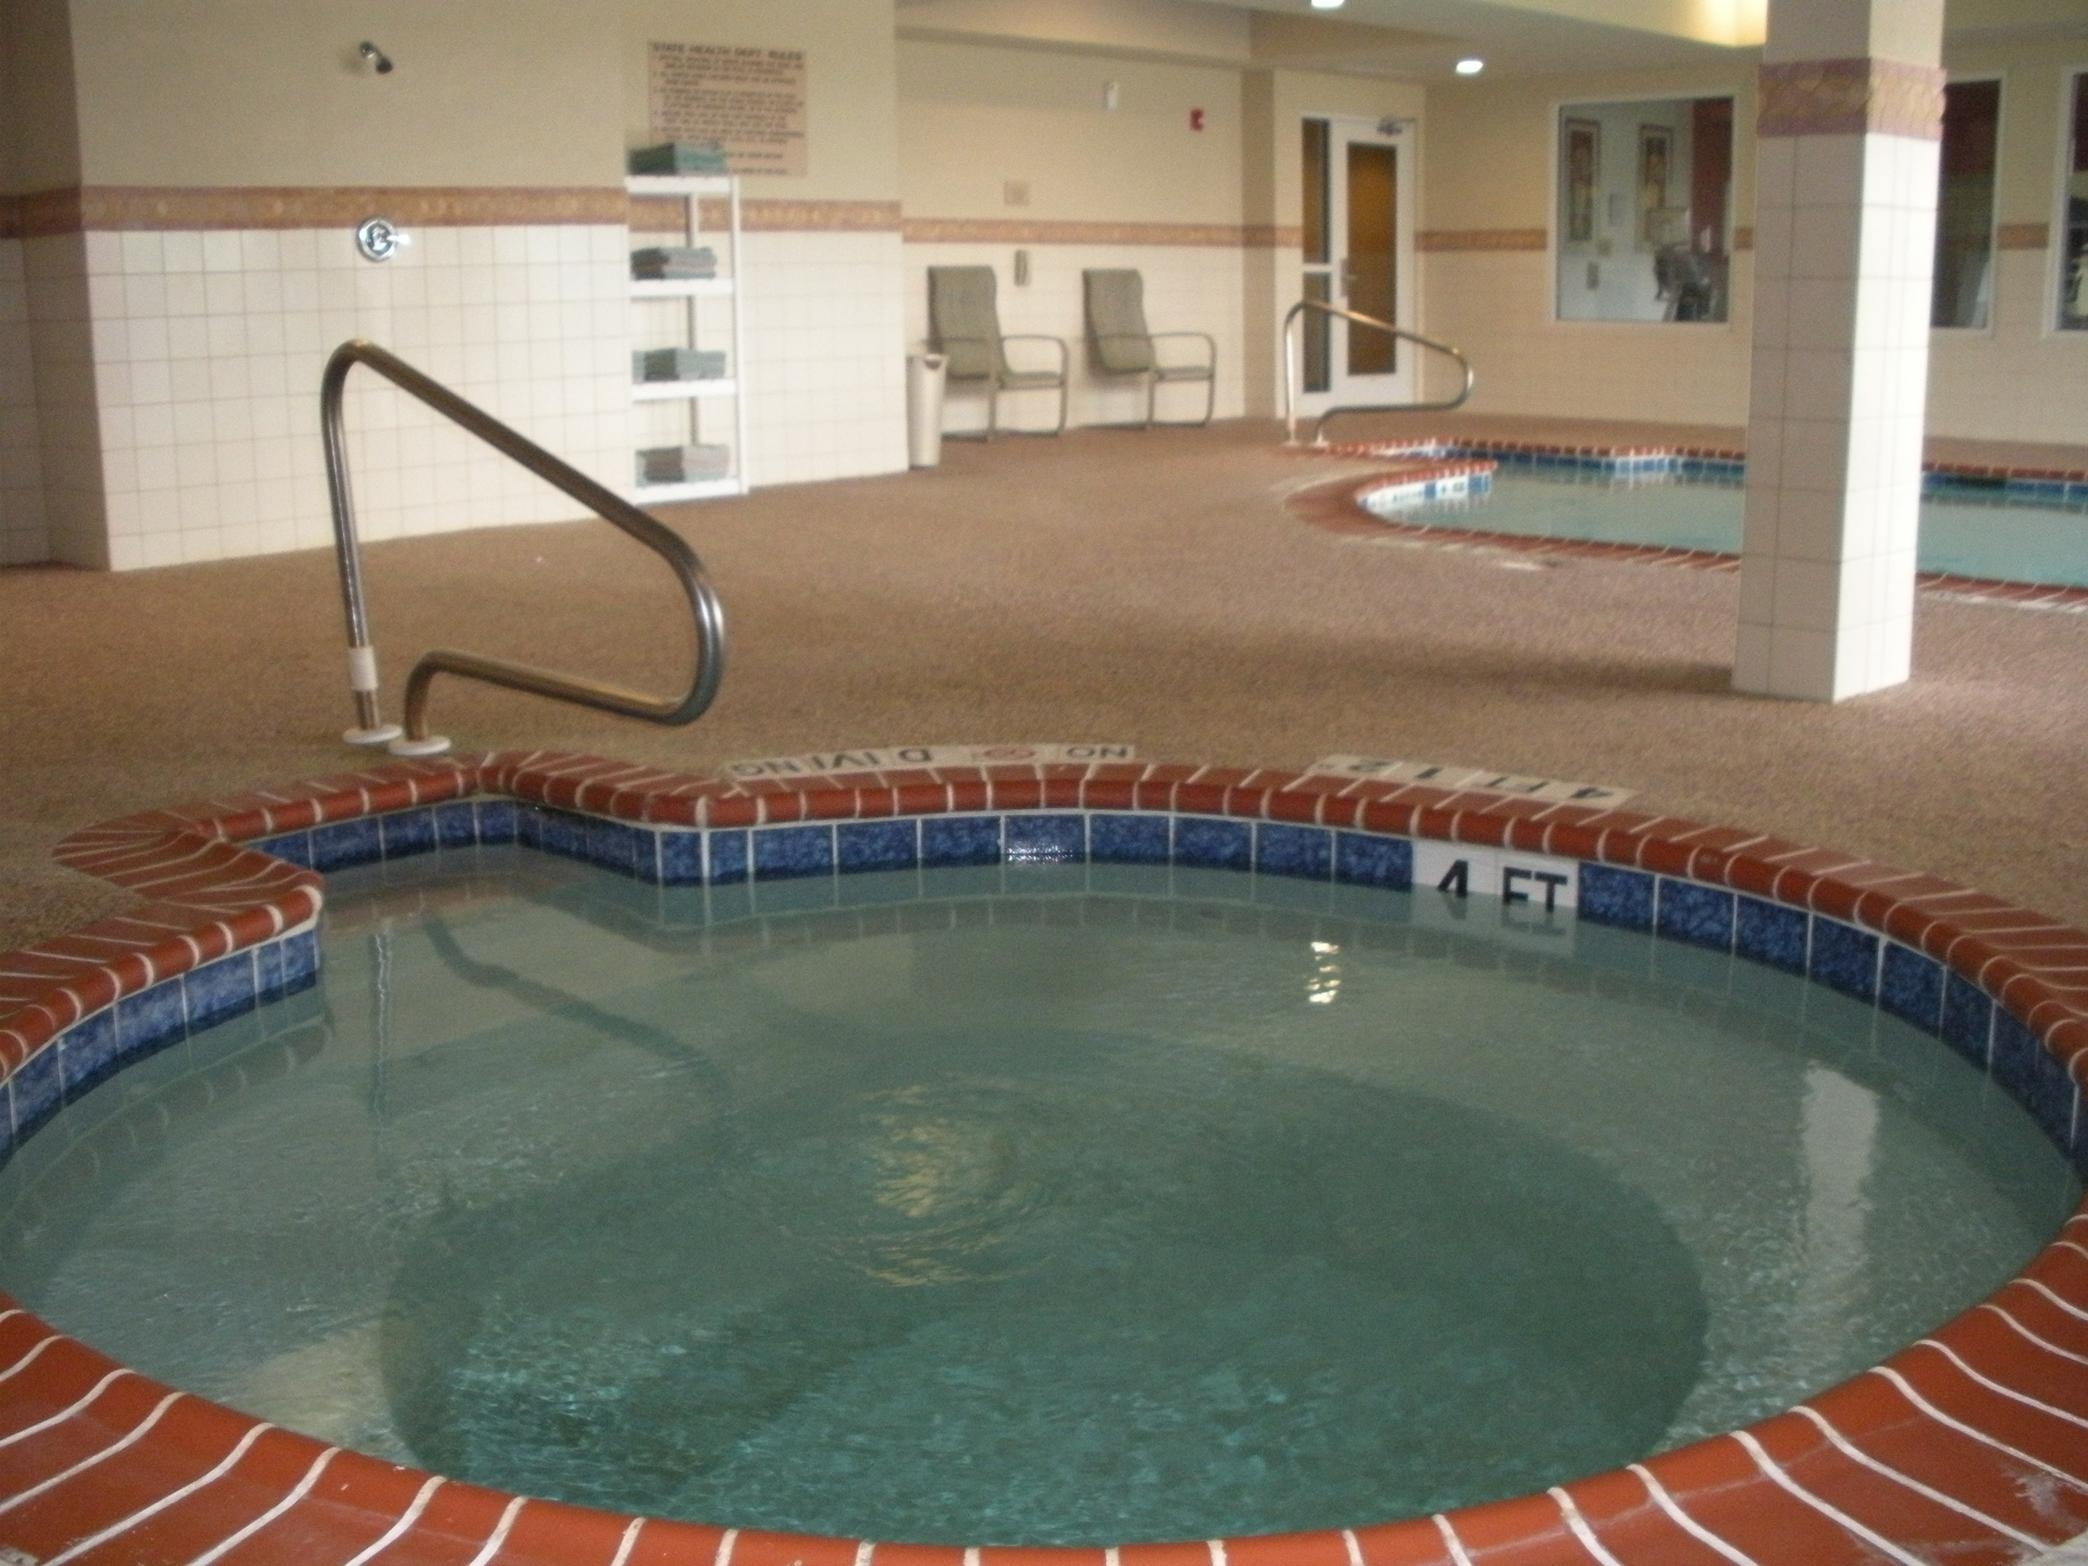 Exceptional Hilton Garden Inn Elkhart 3401 Plaza Court Elkhart, IN Hotels U0026 Motels    MapQuest